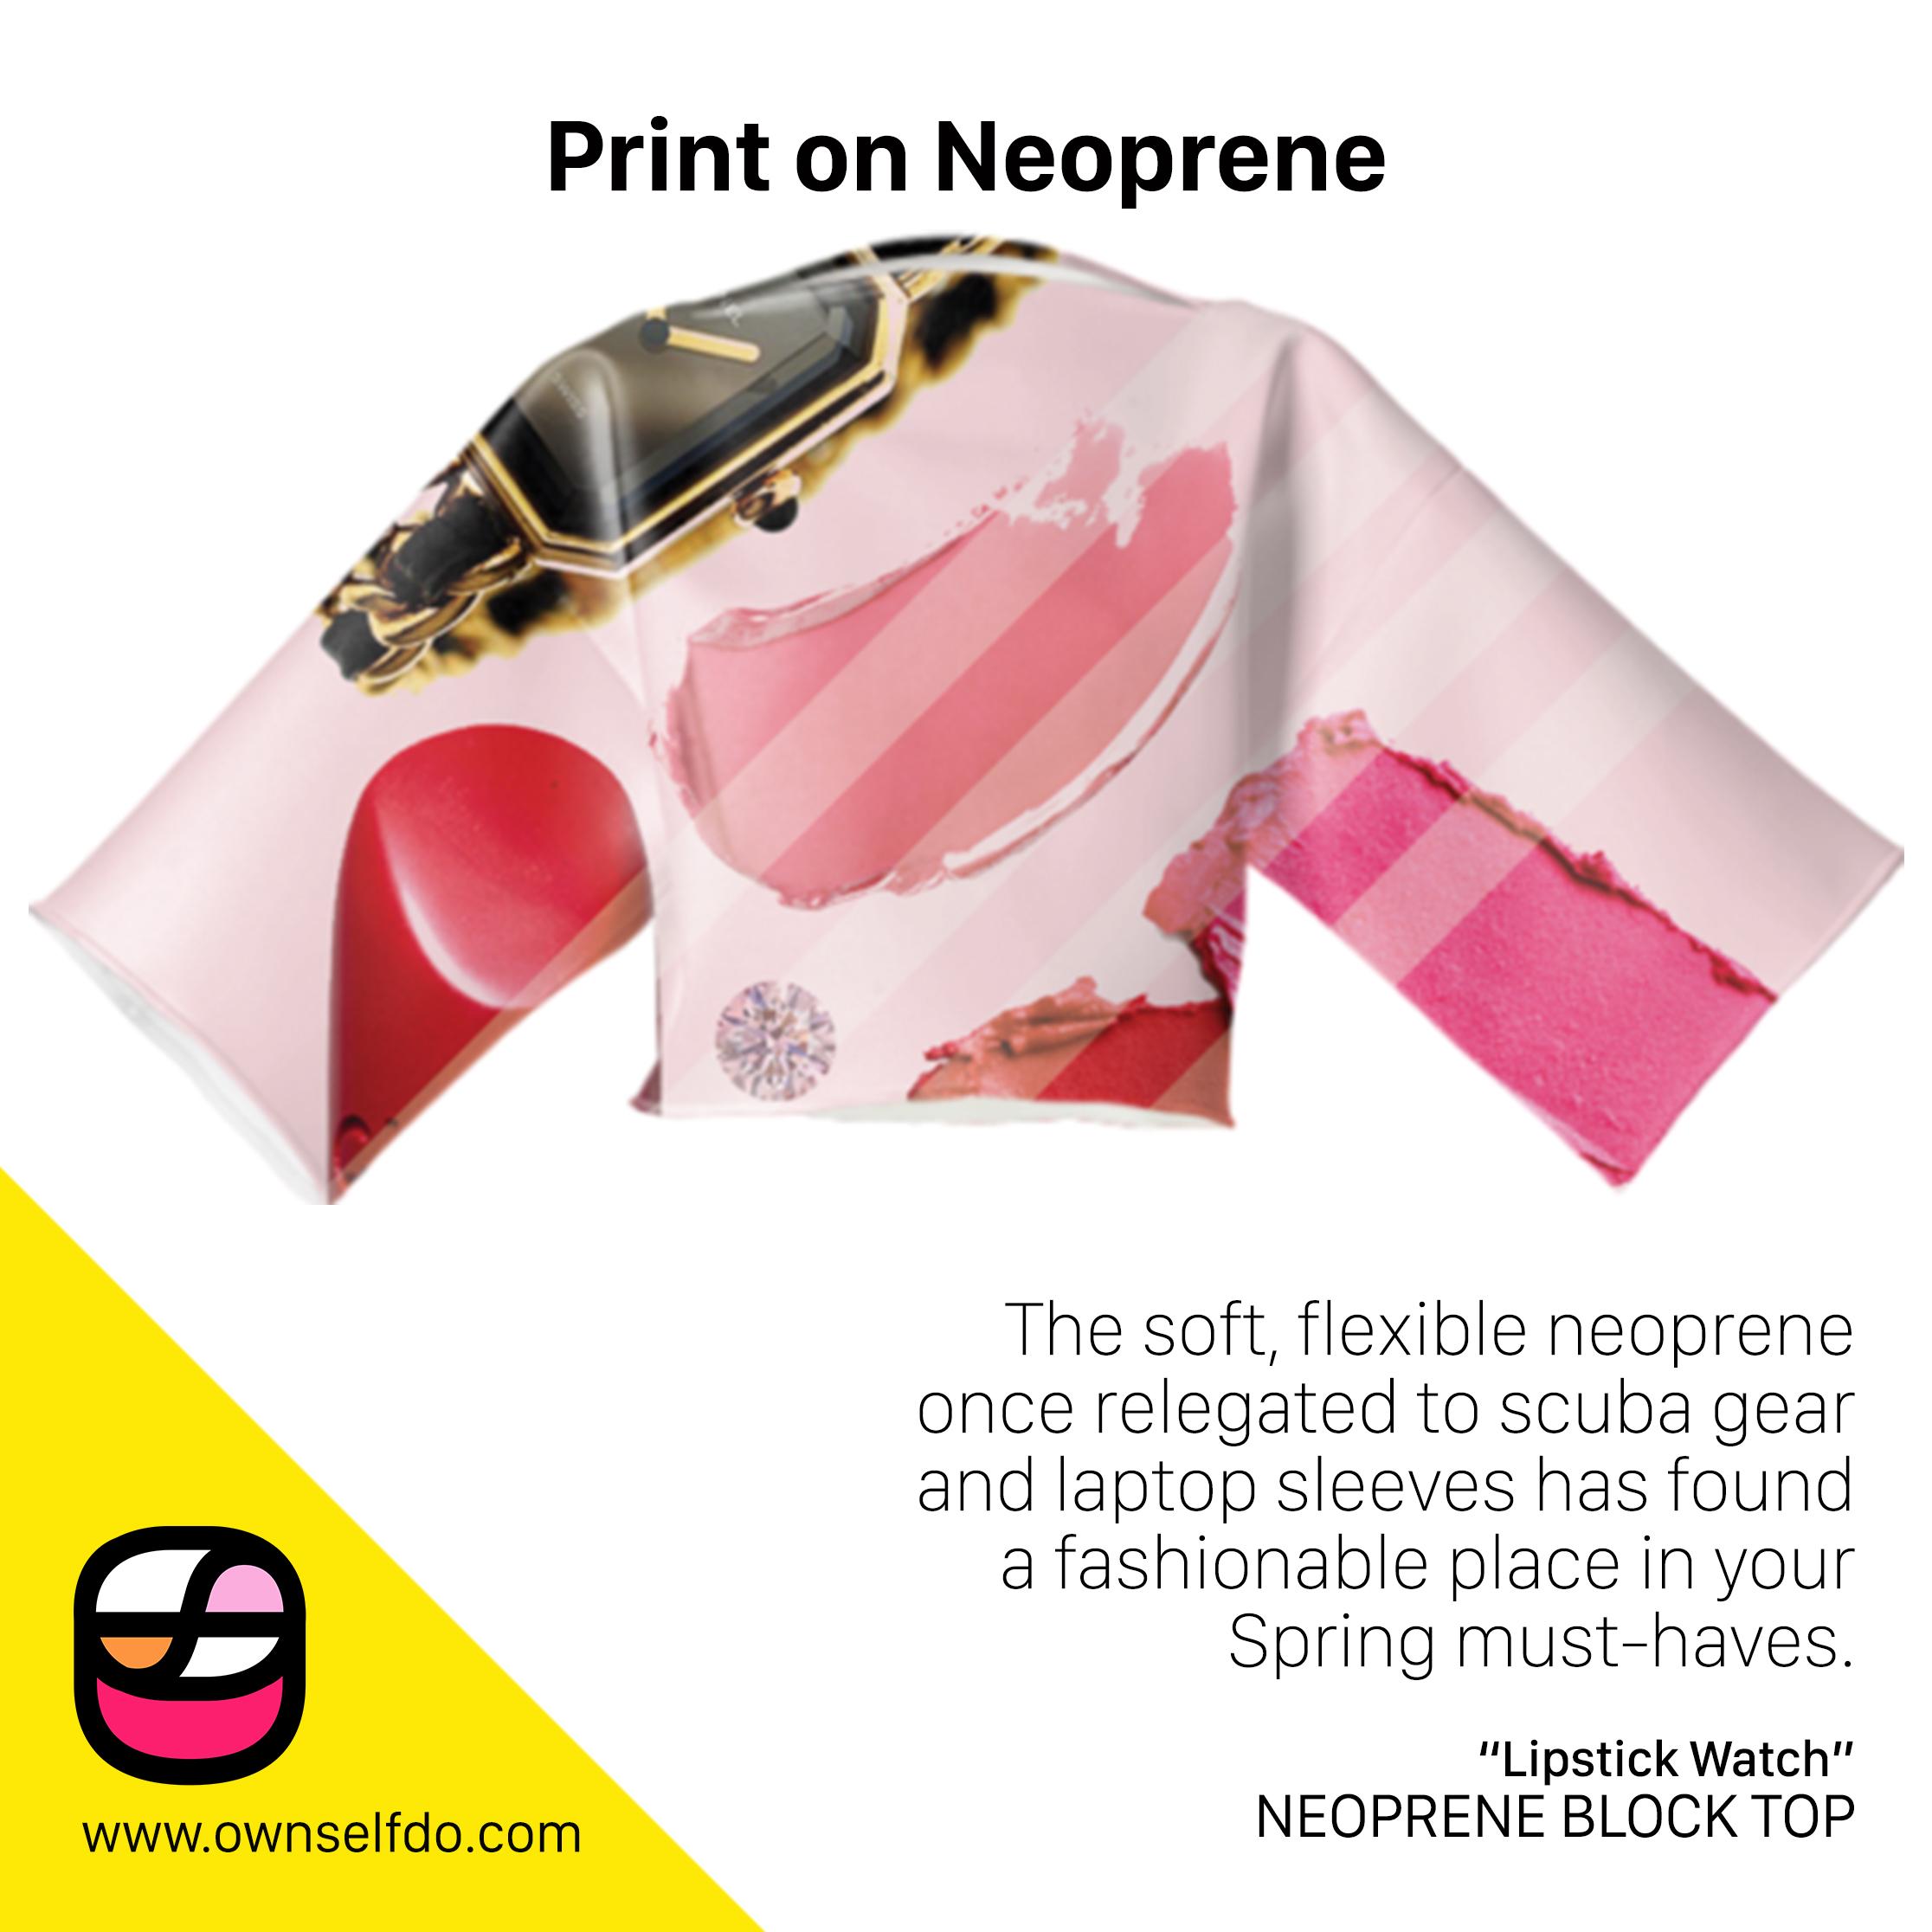 FB_Print on Neoprene.jpg